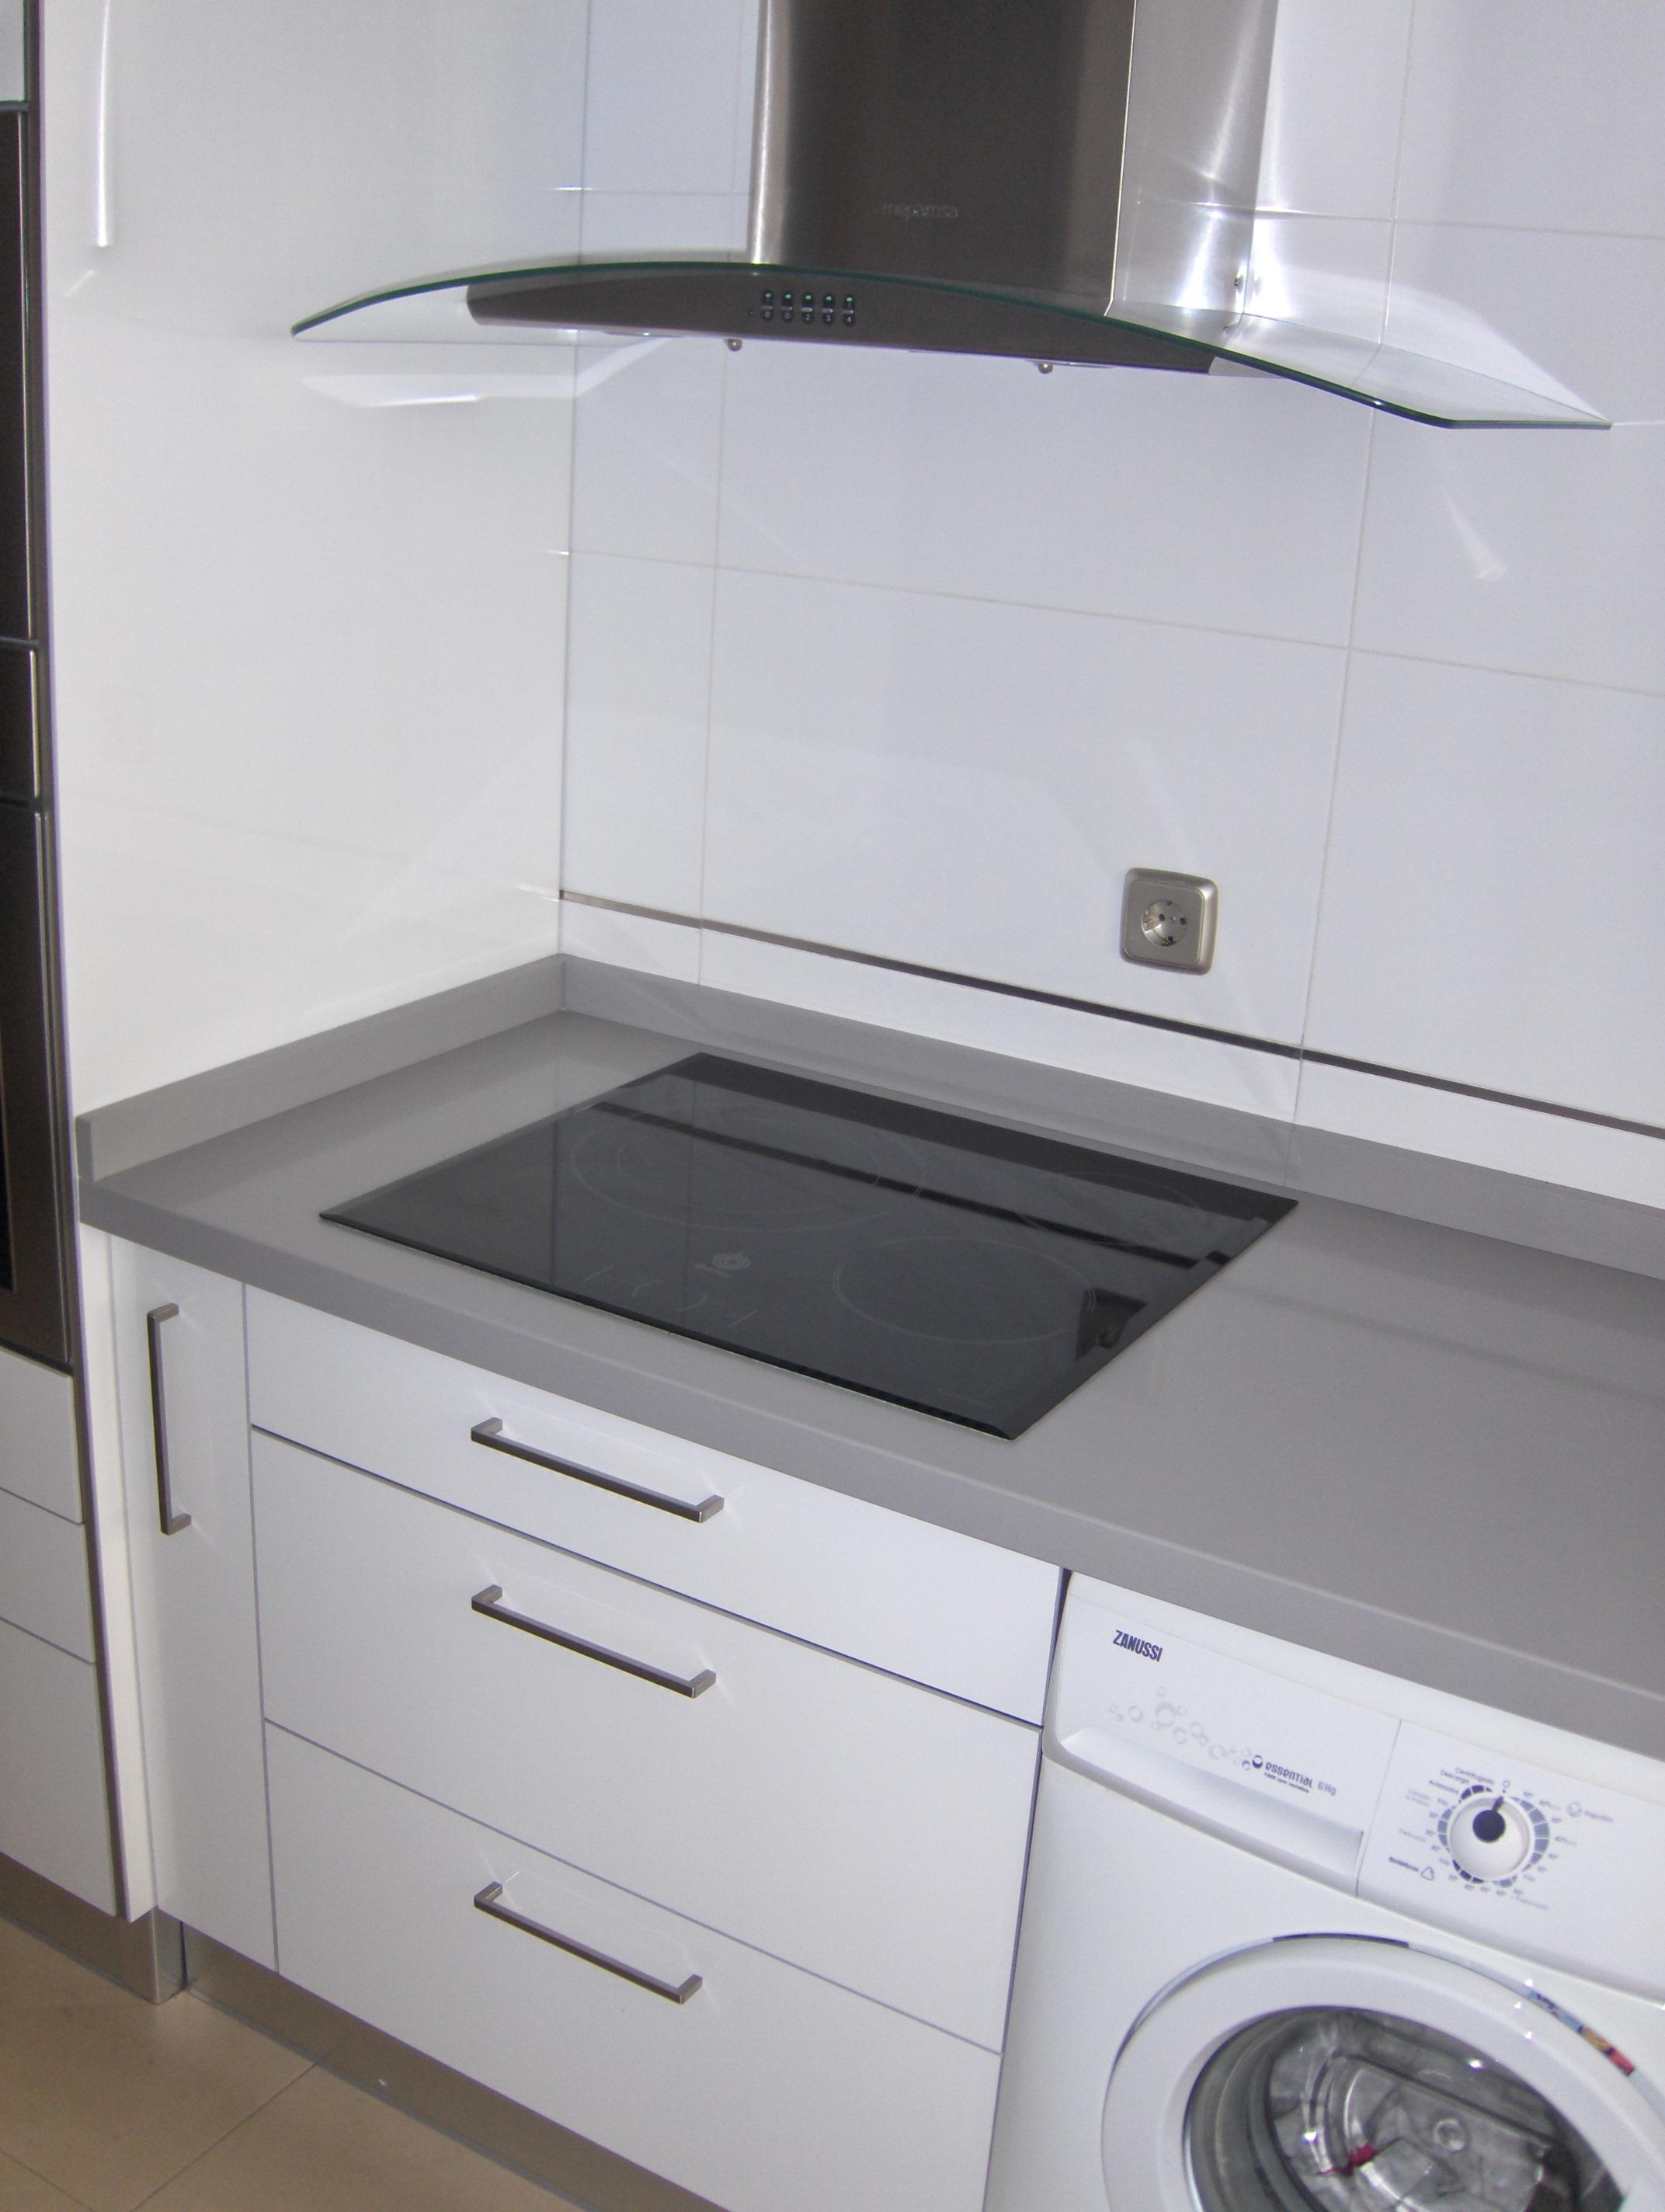 cocinas seleccion sevilla blanca con encimera gris | selección cocinas